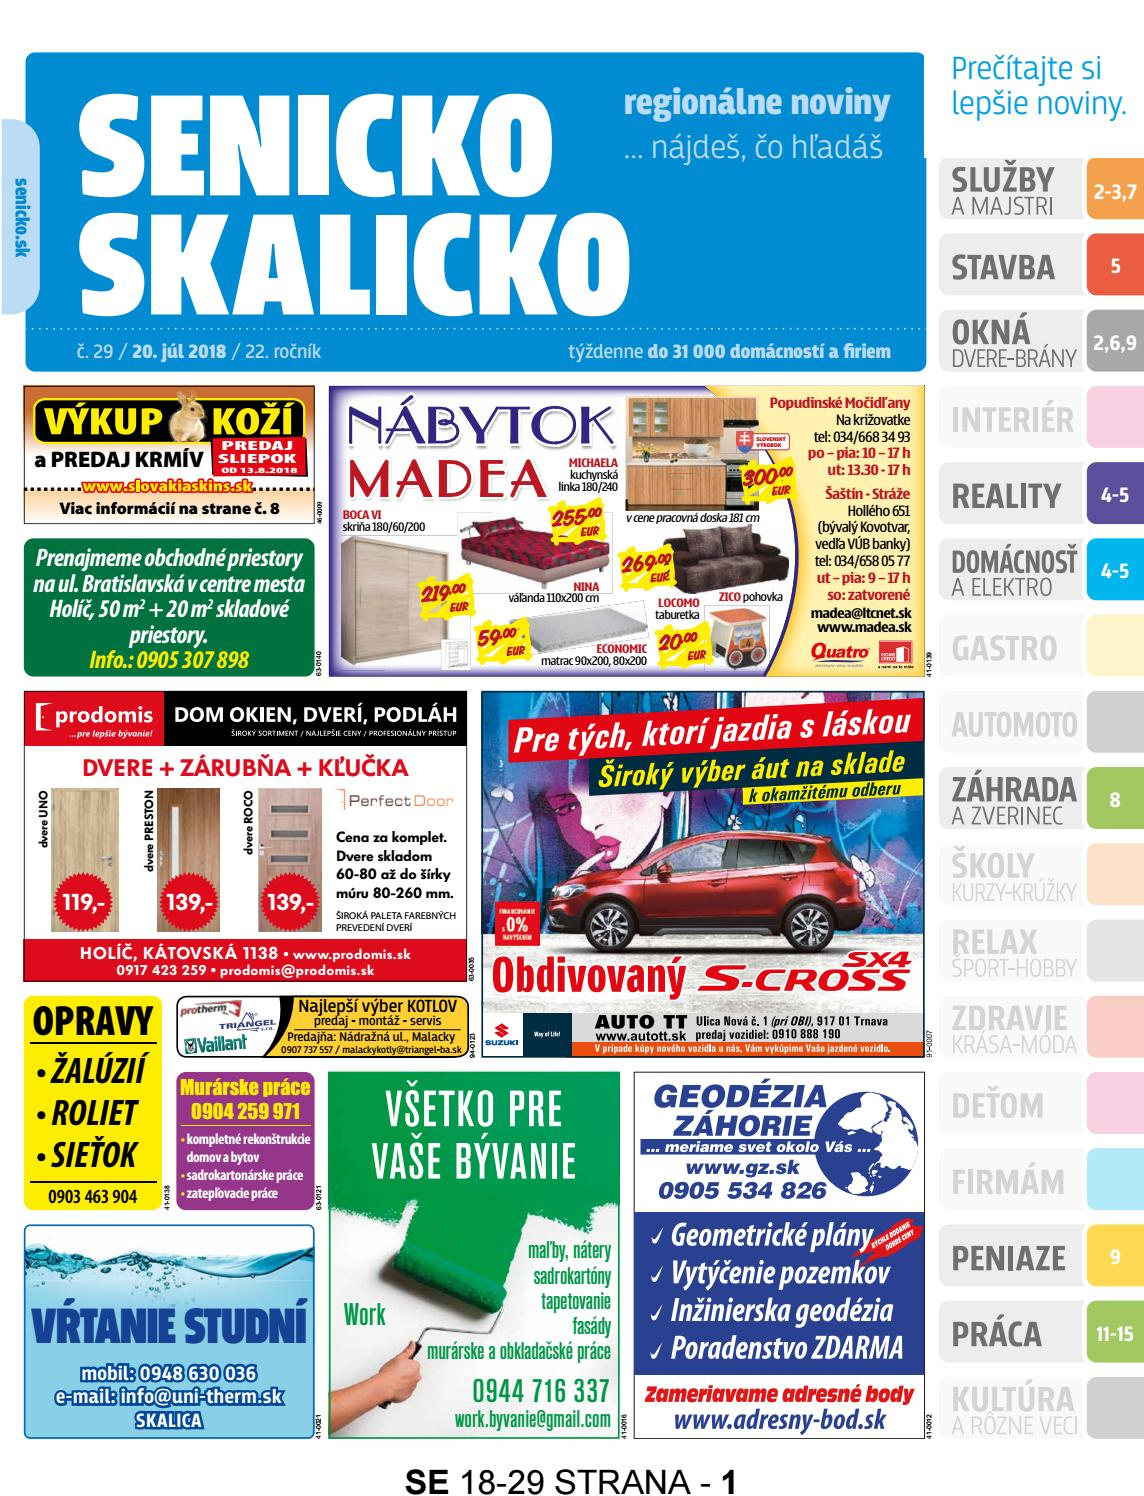 ea6a0dbedcbe4 Senicko-Skalicko 18-29 by skalicko skalicko - issuu